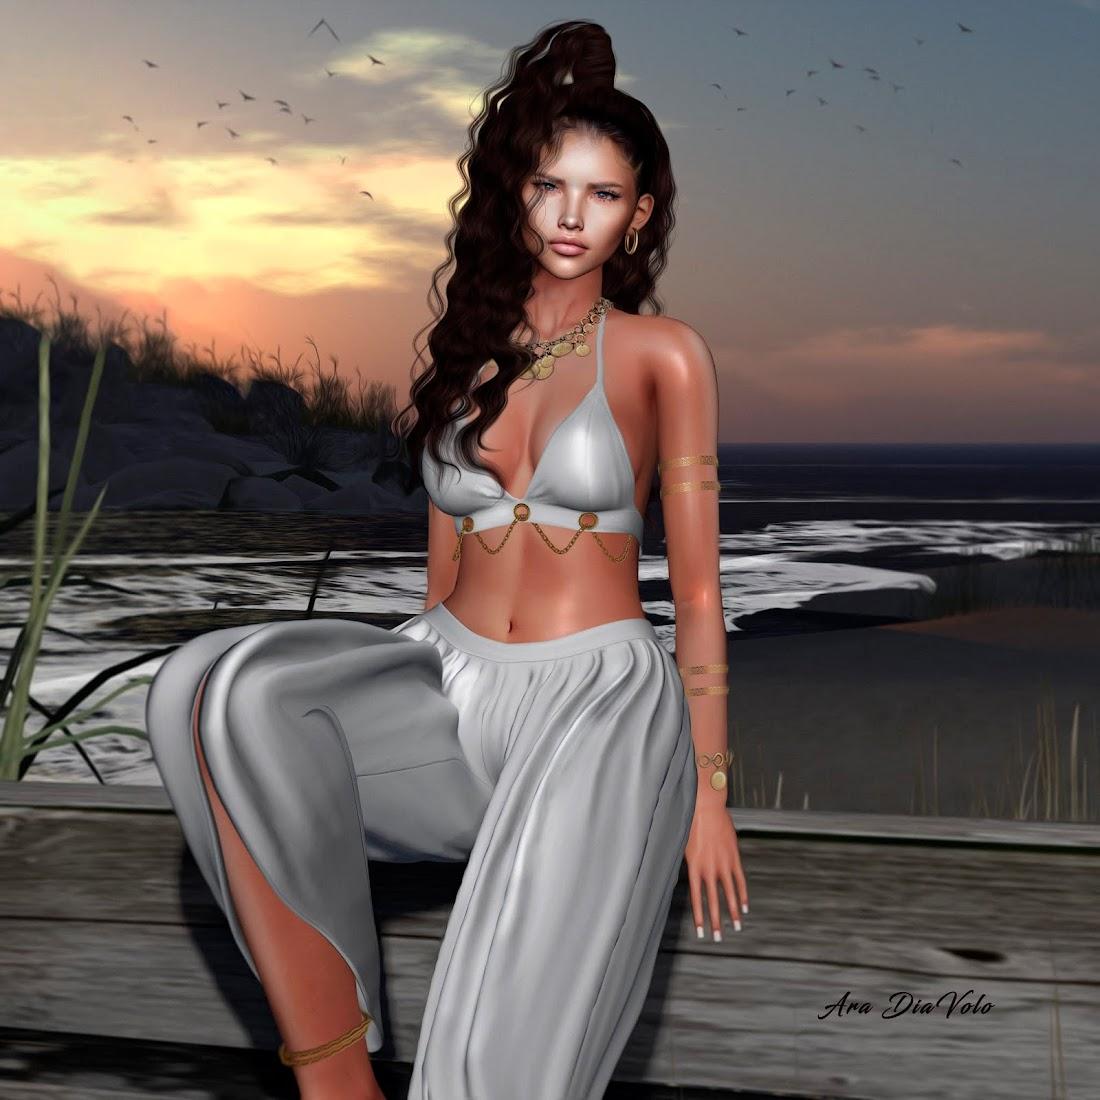 Miss Chelsea - Photo Comp 2020 - Aradhelia Diavolo